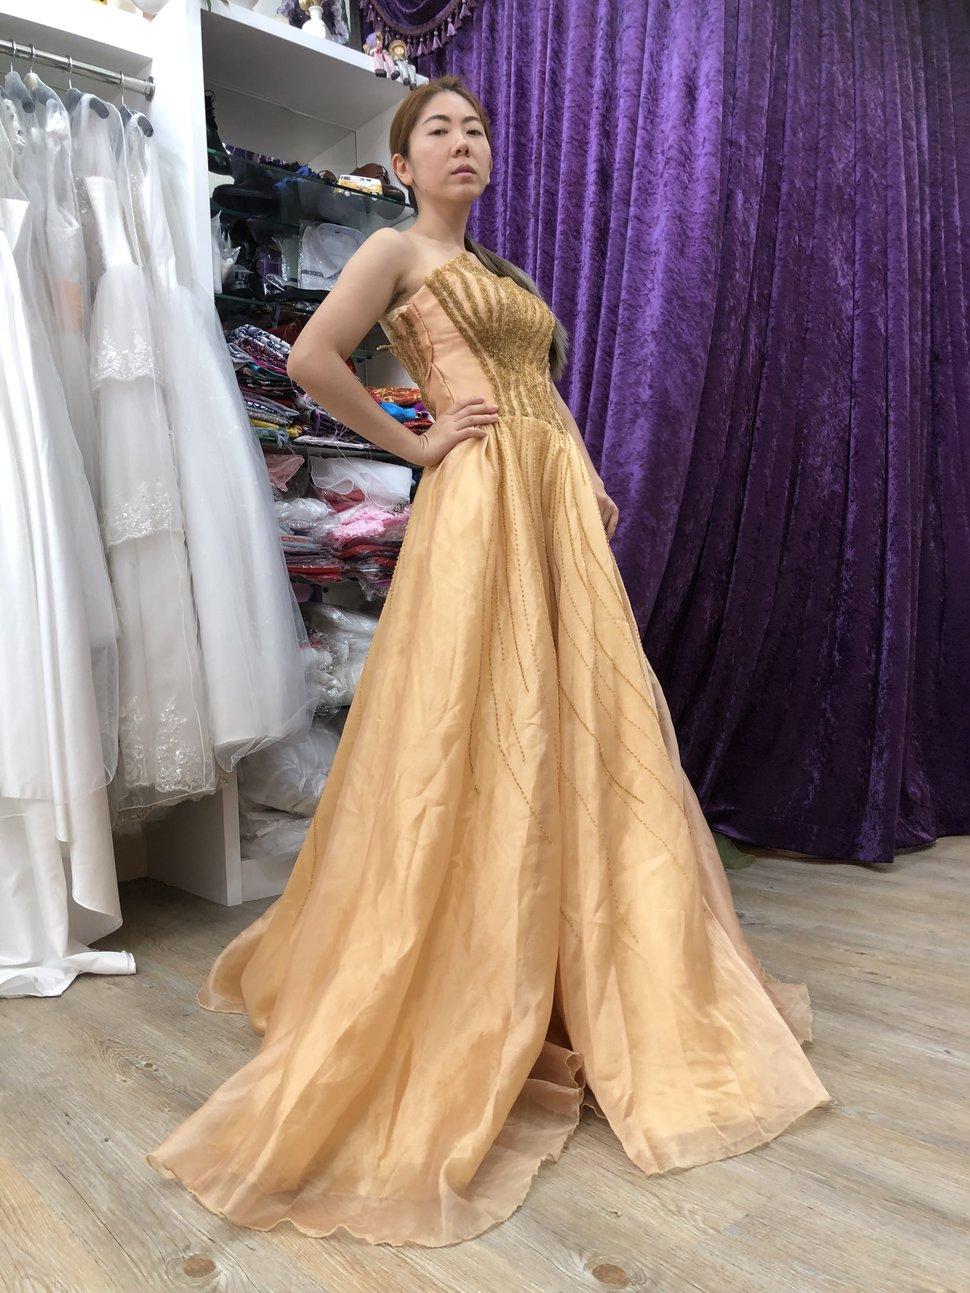 IMG_5972 - 全台最便宜-45DESIGN四五婚紗禮服《結婚吧》